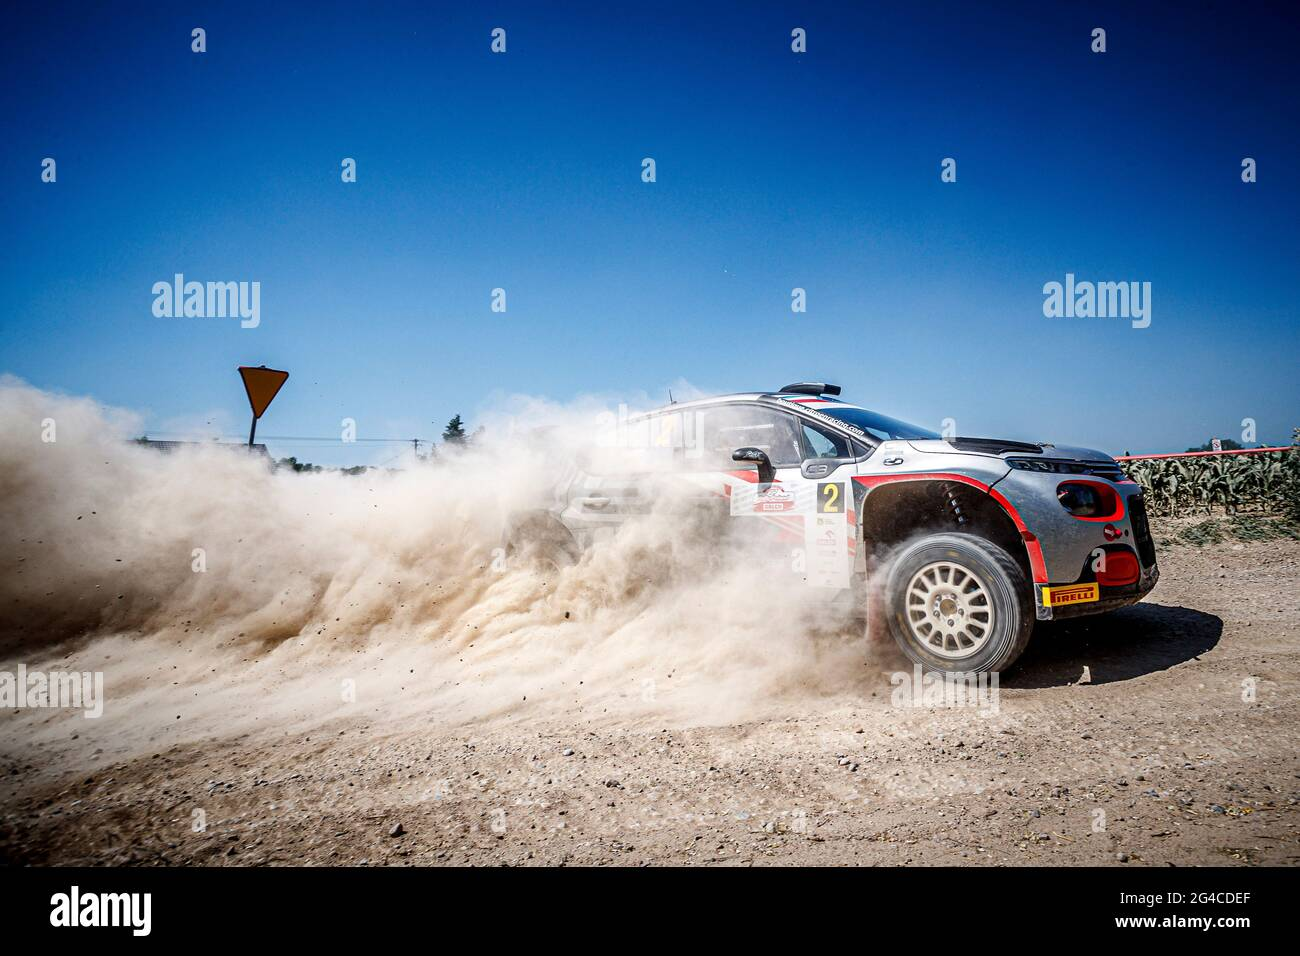 Mikolajki, Polonia. 20 Giugno 2021. 02 POOM Roland (EST), GARROD Darren (GBR), SAINTELOC JUNIOR TEAM, citroen C3, azione durante il Rally Polonia 2021, 1° round del Campionato europeo Rally FIA 2021, dal 18 al 20 giugno 2020 a Mikolajki, Polonia - Foto Grégory Lenenmand / DPPI Credit: DPI Media/Alamy Live News Foto Stock